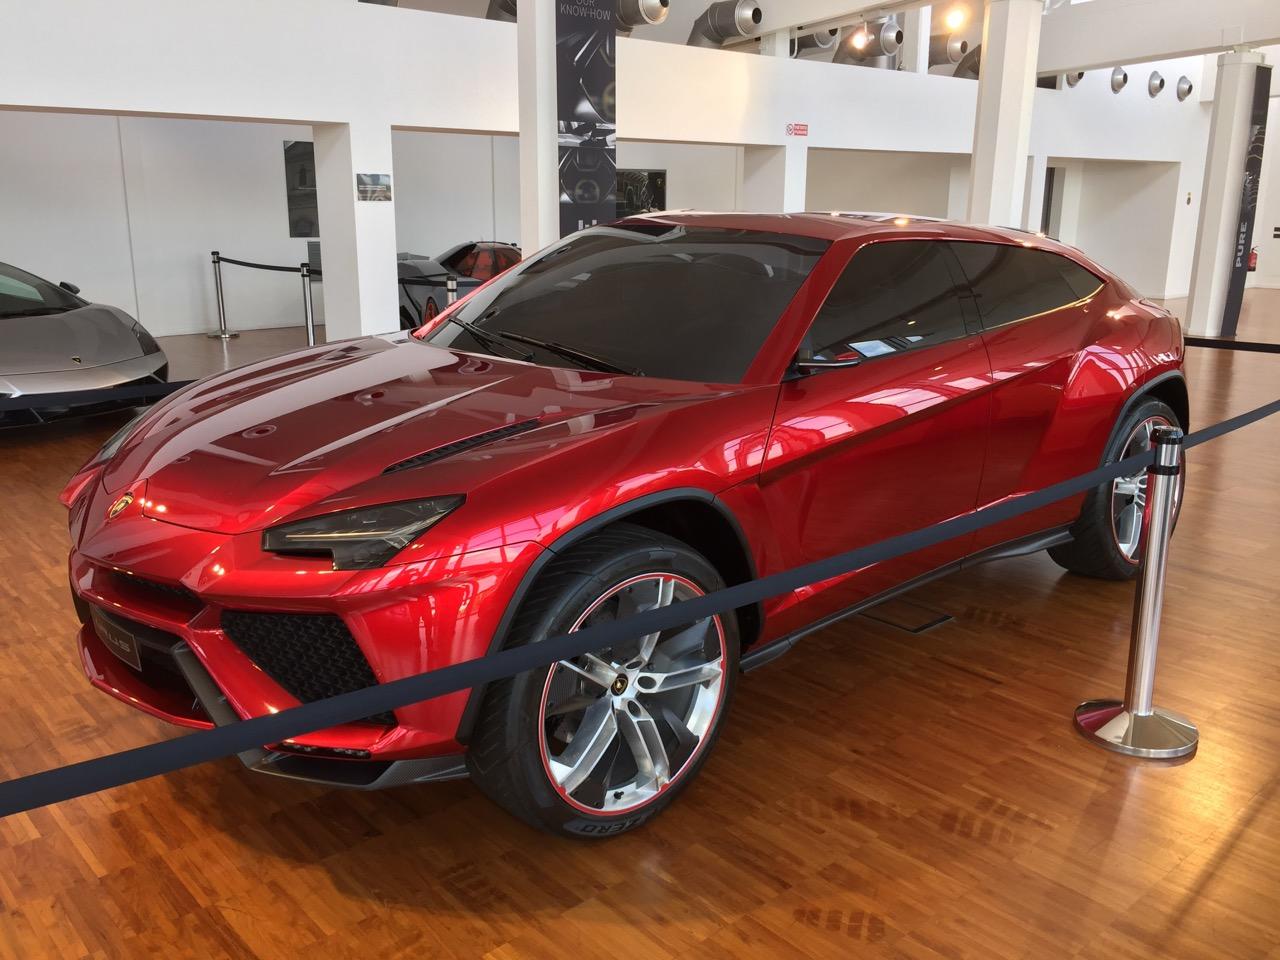 Стартовал приём заказов накроссовер Lamborghini Urus